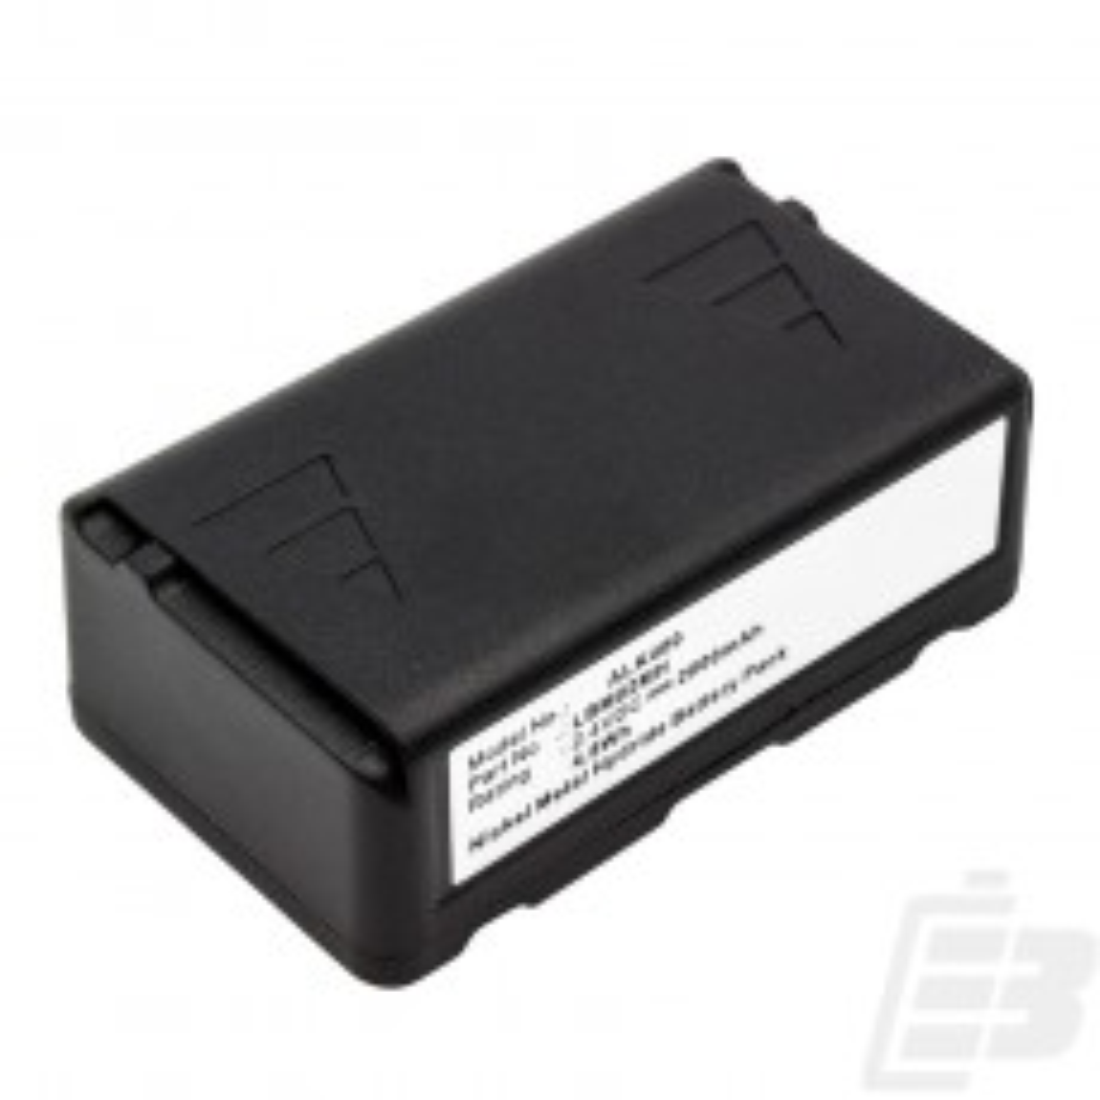 Crane remote control battery Autec Light LK4_1